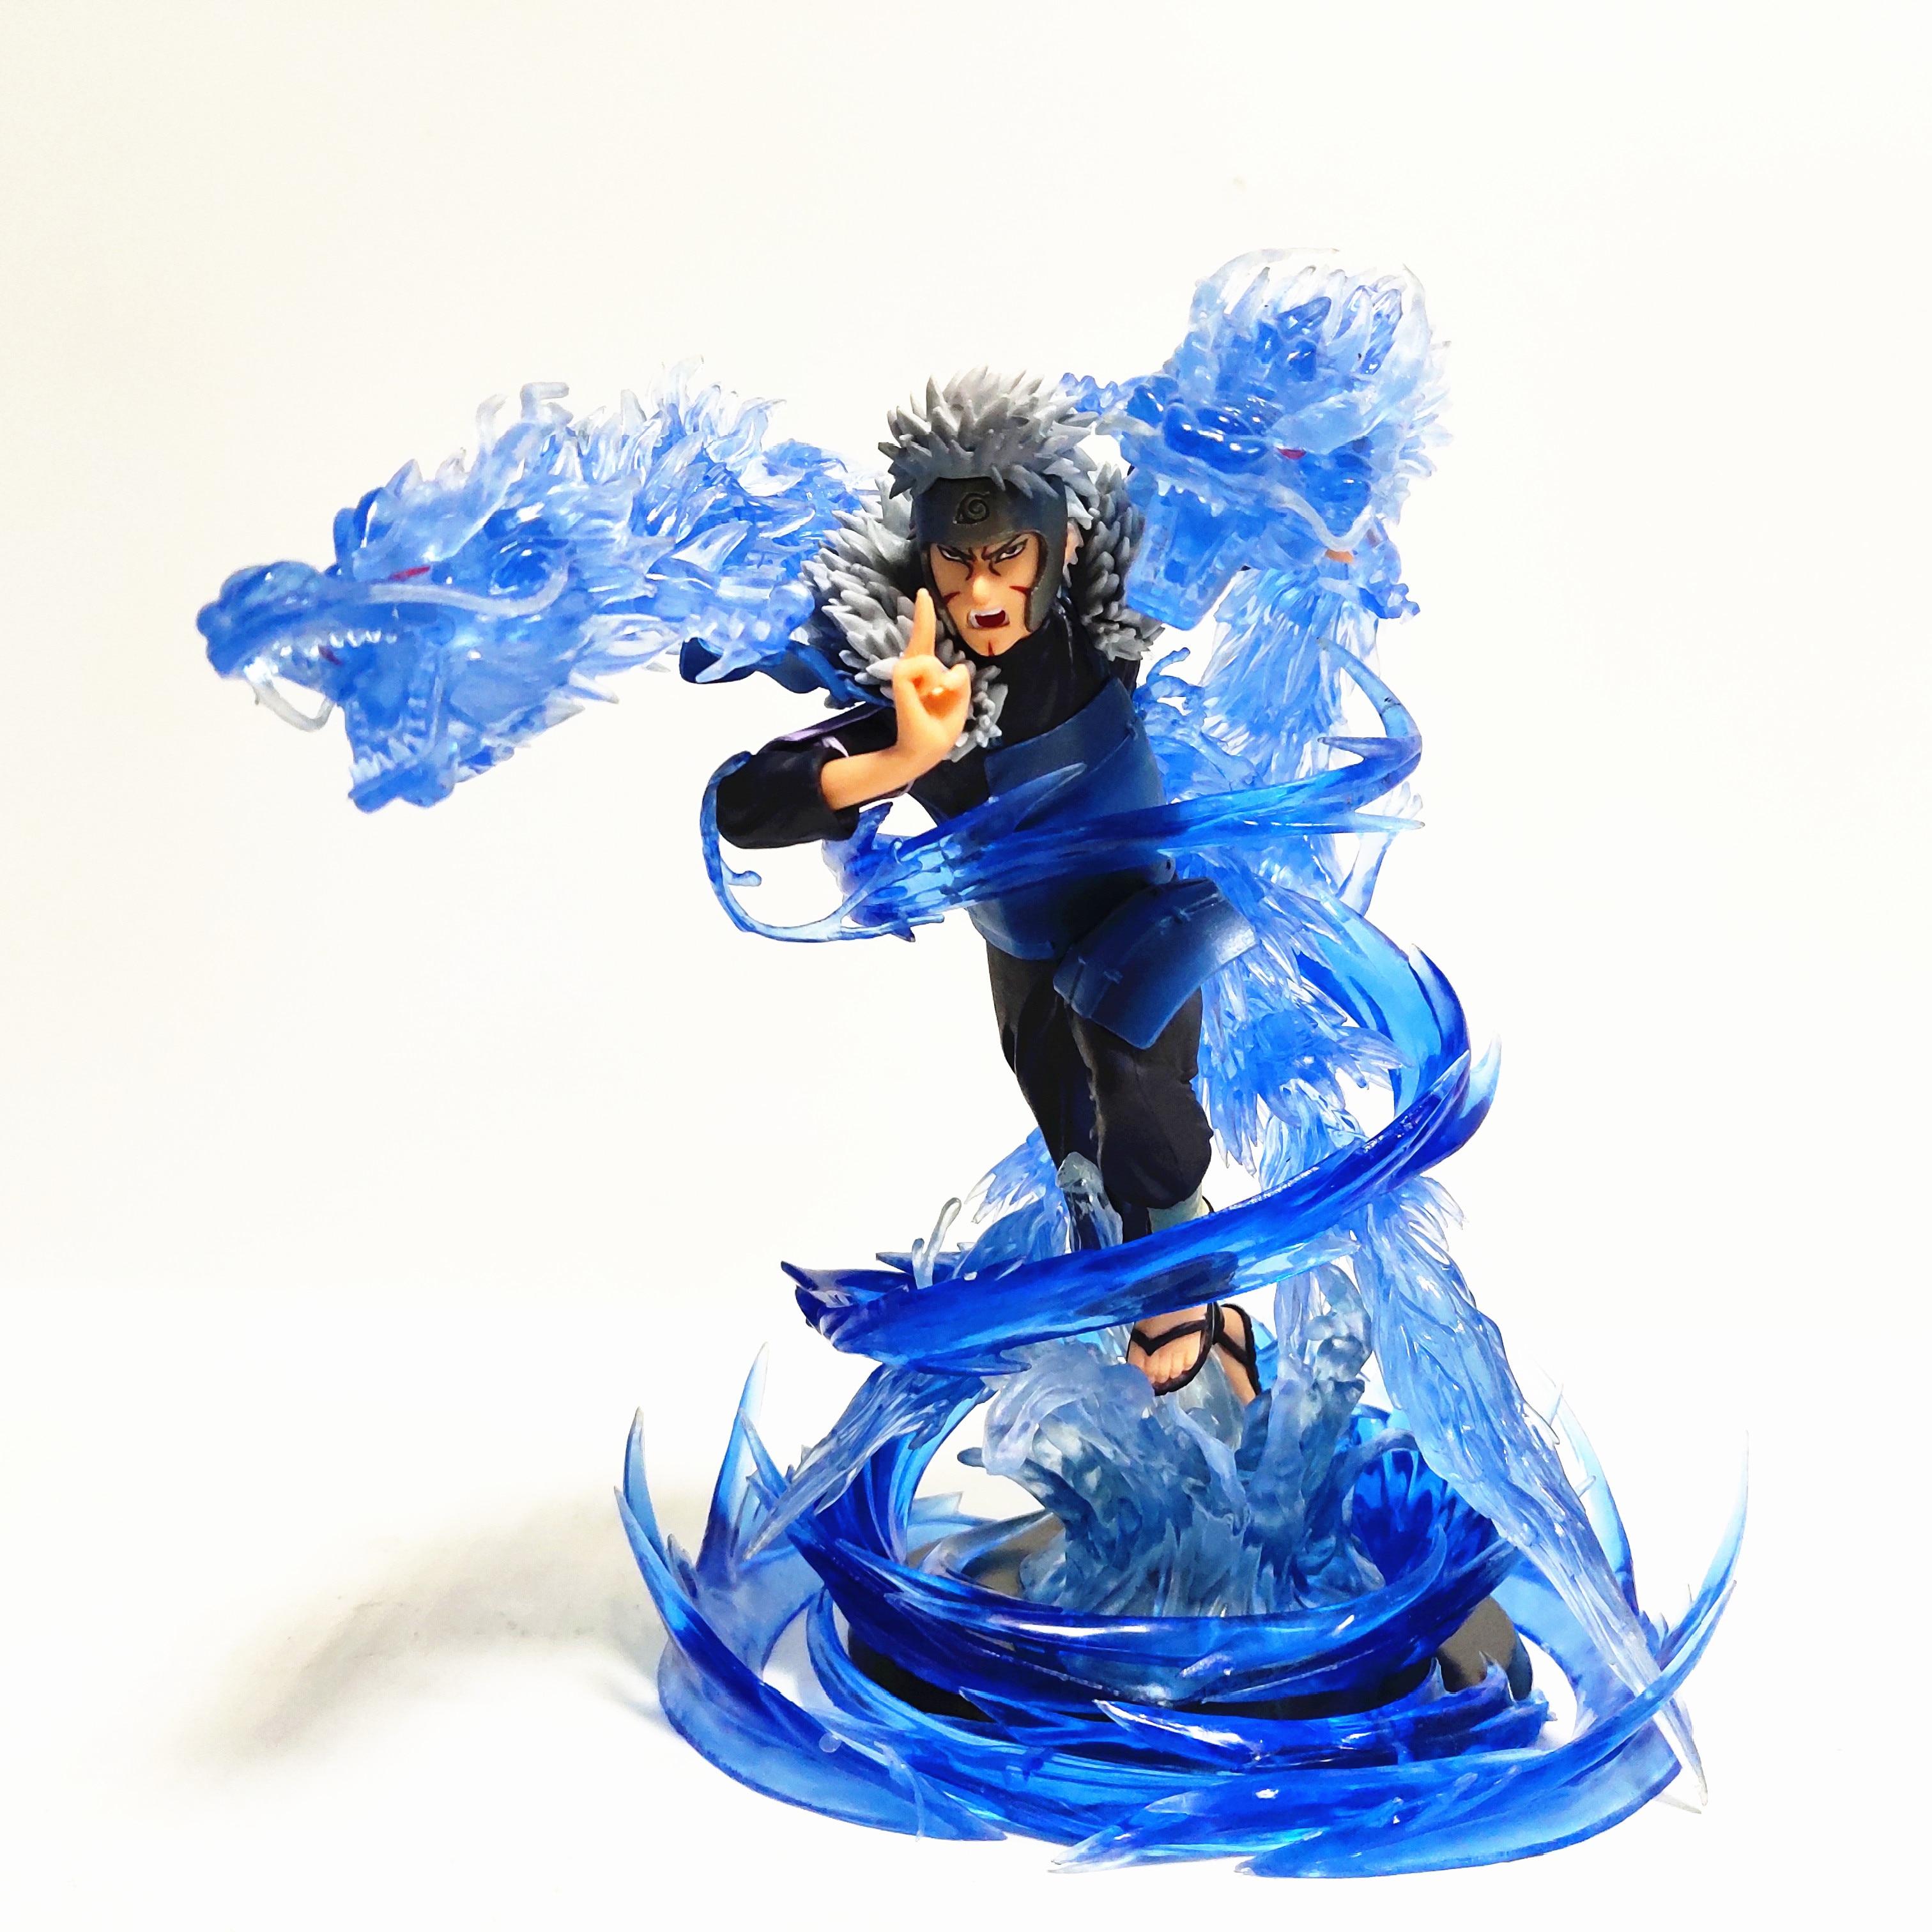 Naruto Senju Tobirama eau Dragon balle PVC figurines d'action bricolage ensemble Anime Naruto Shippuden Figurine jouet Diorama Brinquedos